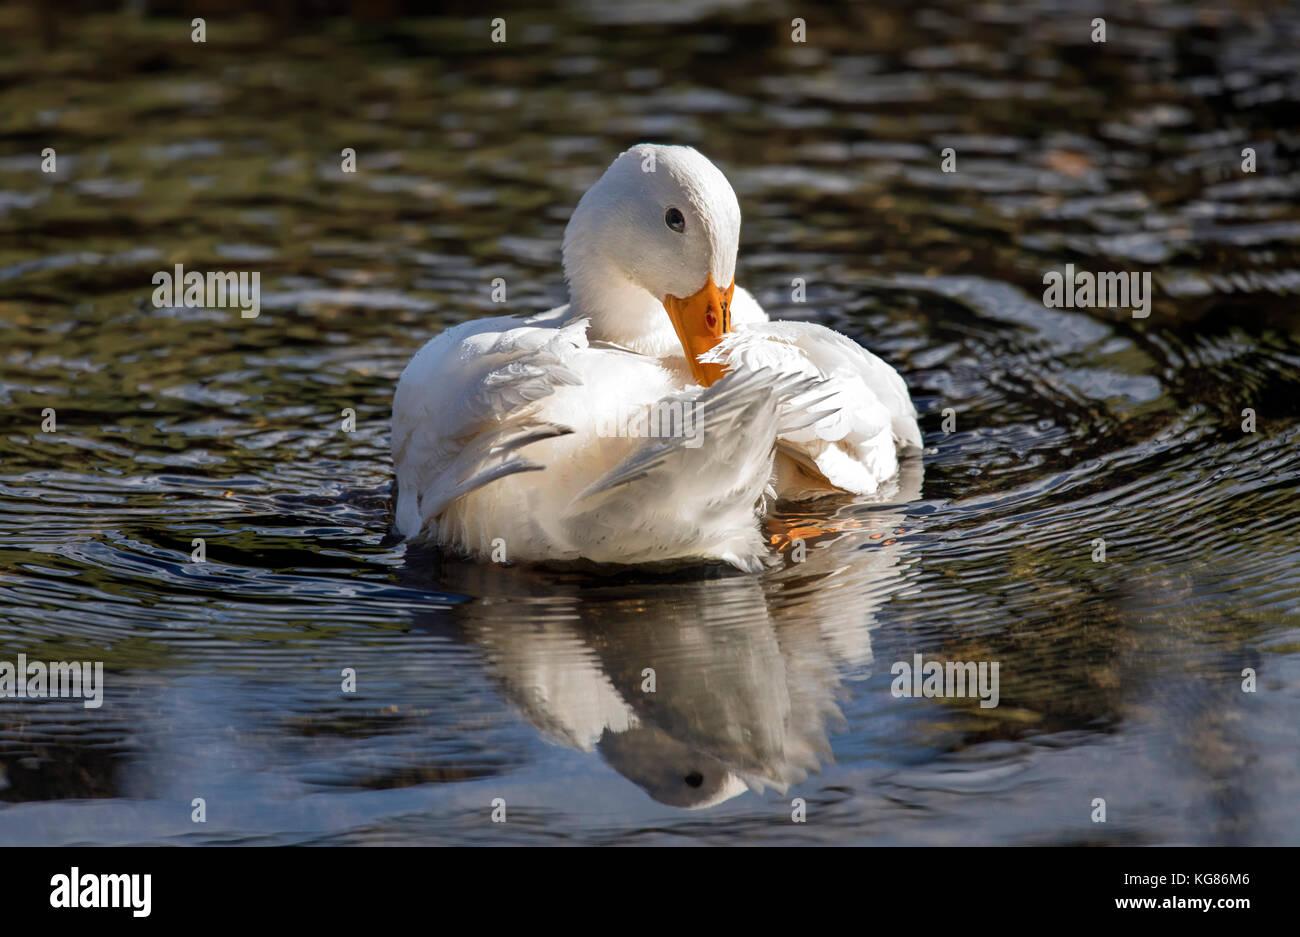 Pekin duck, in the river preening and washing itself - Stock Image